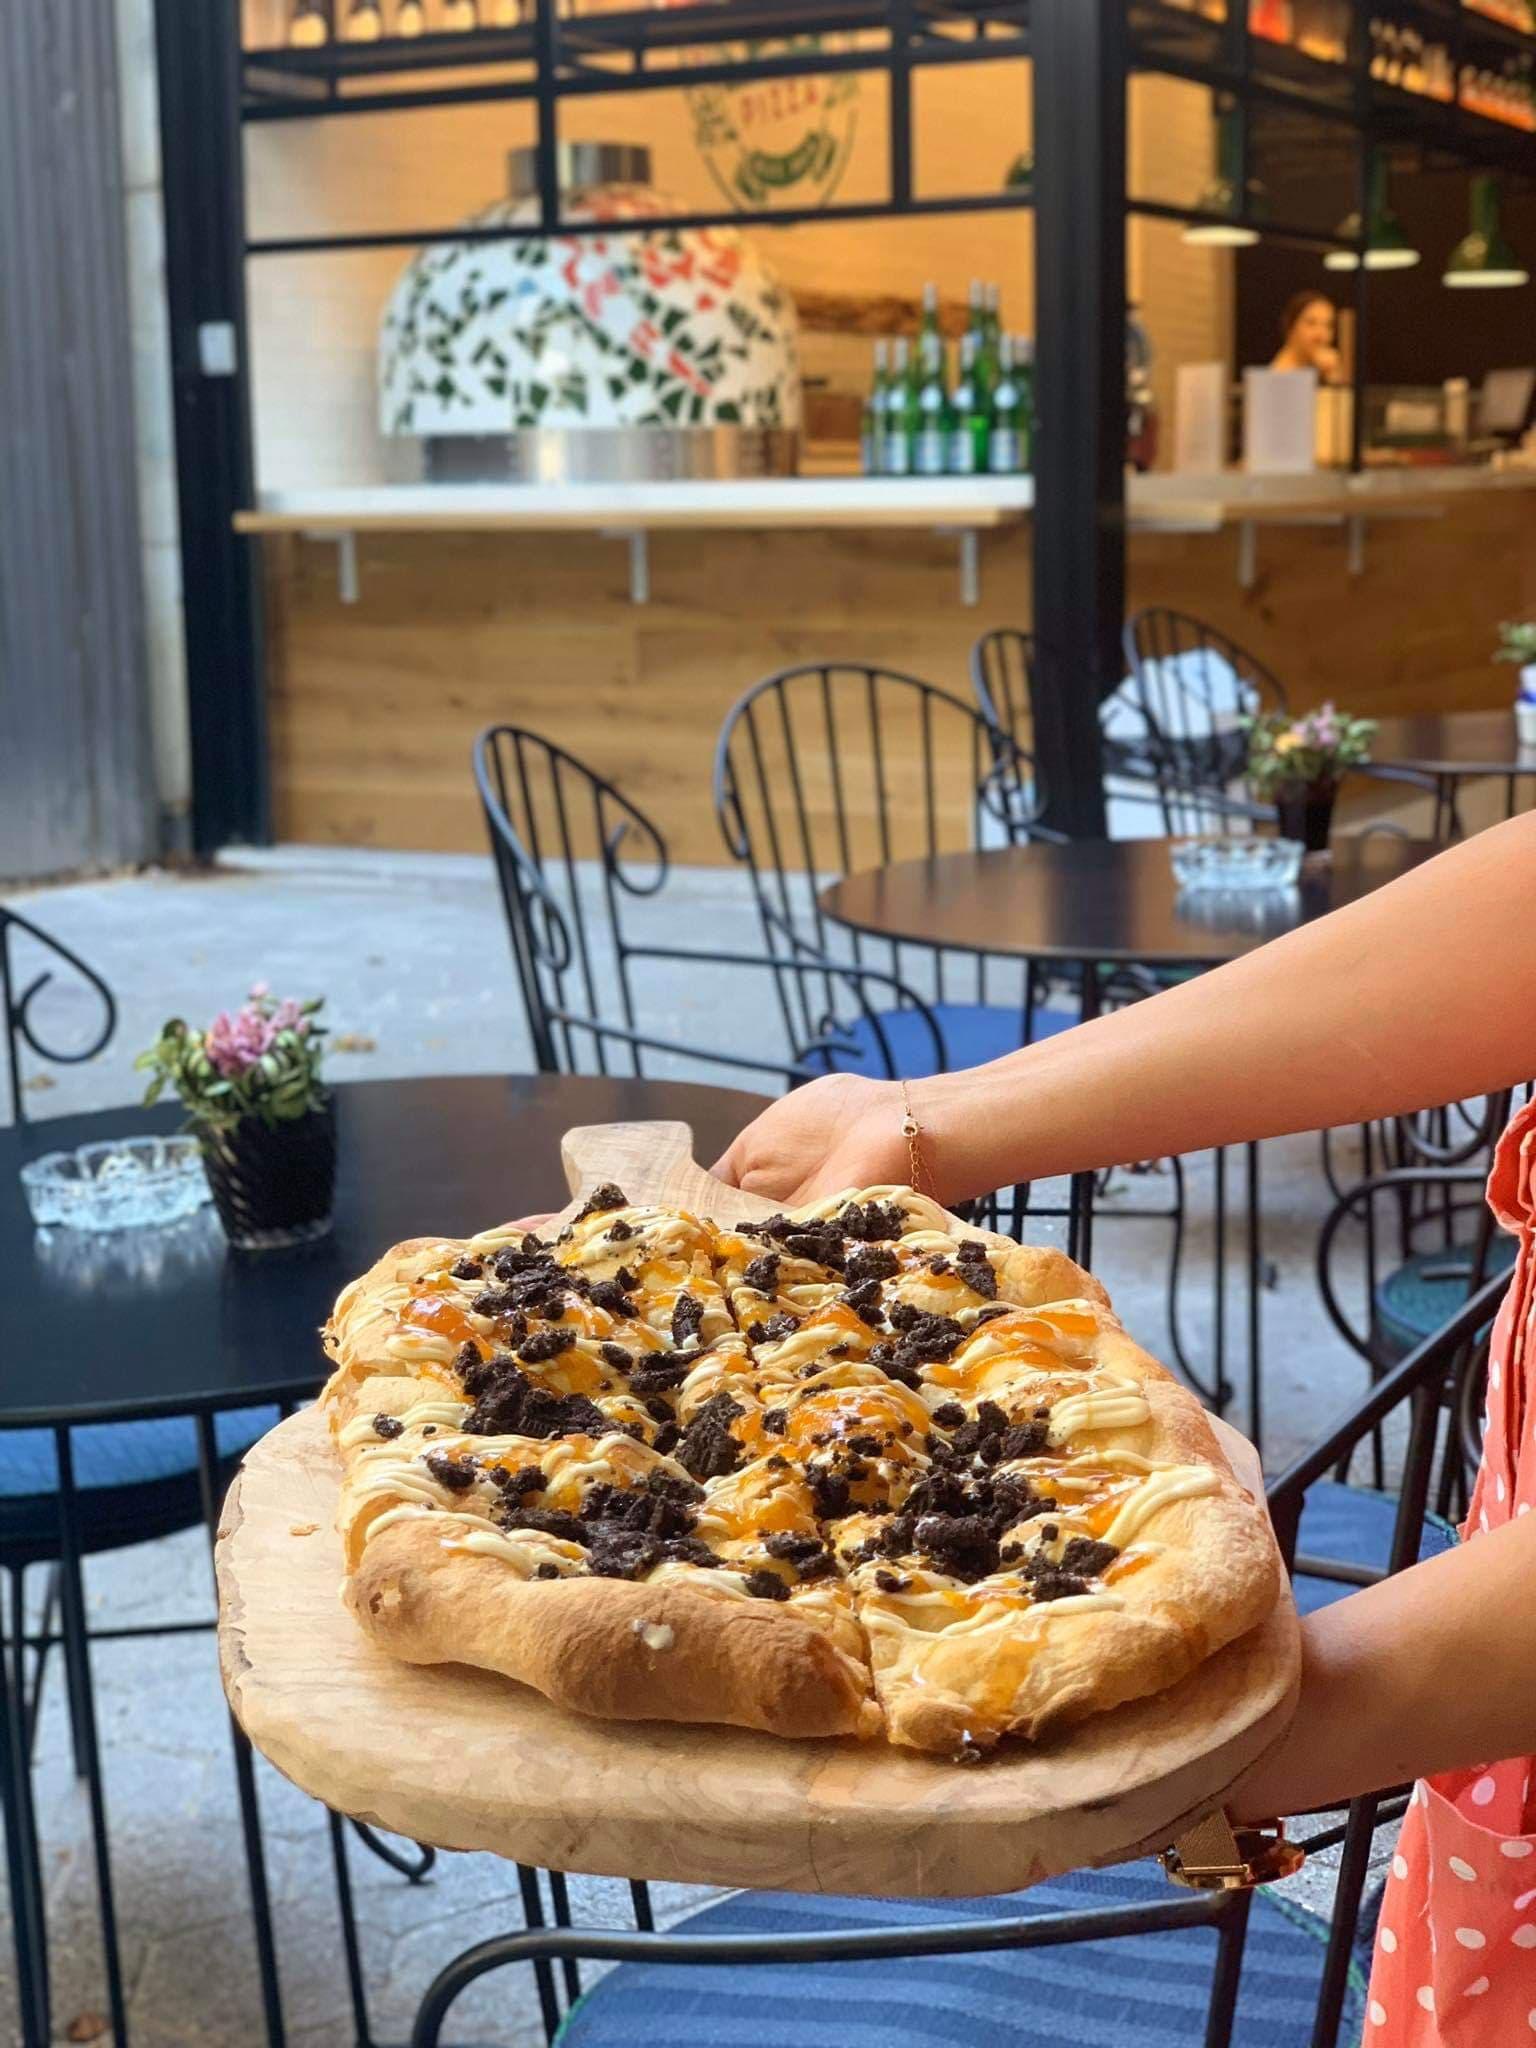 «Pizza Dal Professore»: Ο «καθηγητής» θα φέρει την πίτσα σπίτι μας